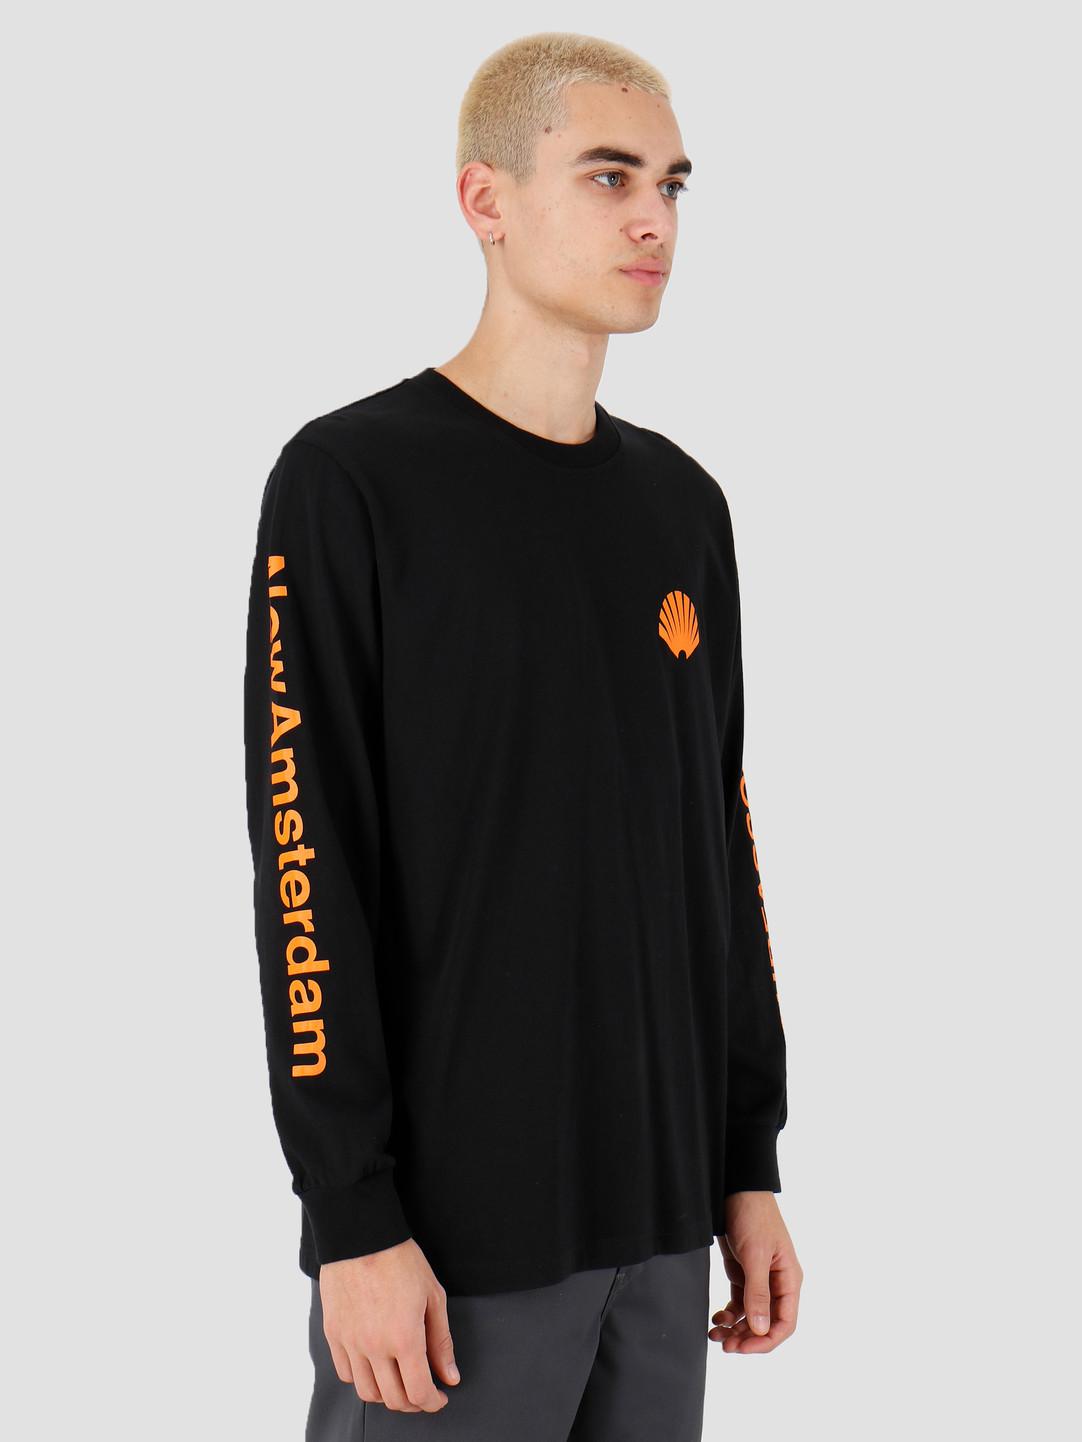 New Amsterdam Surf association New Amsterdam Surf association Logo longsleeve Black 2018031